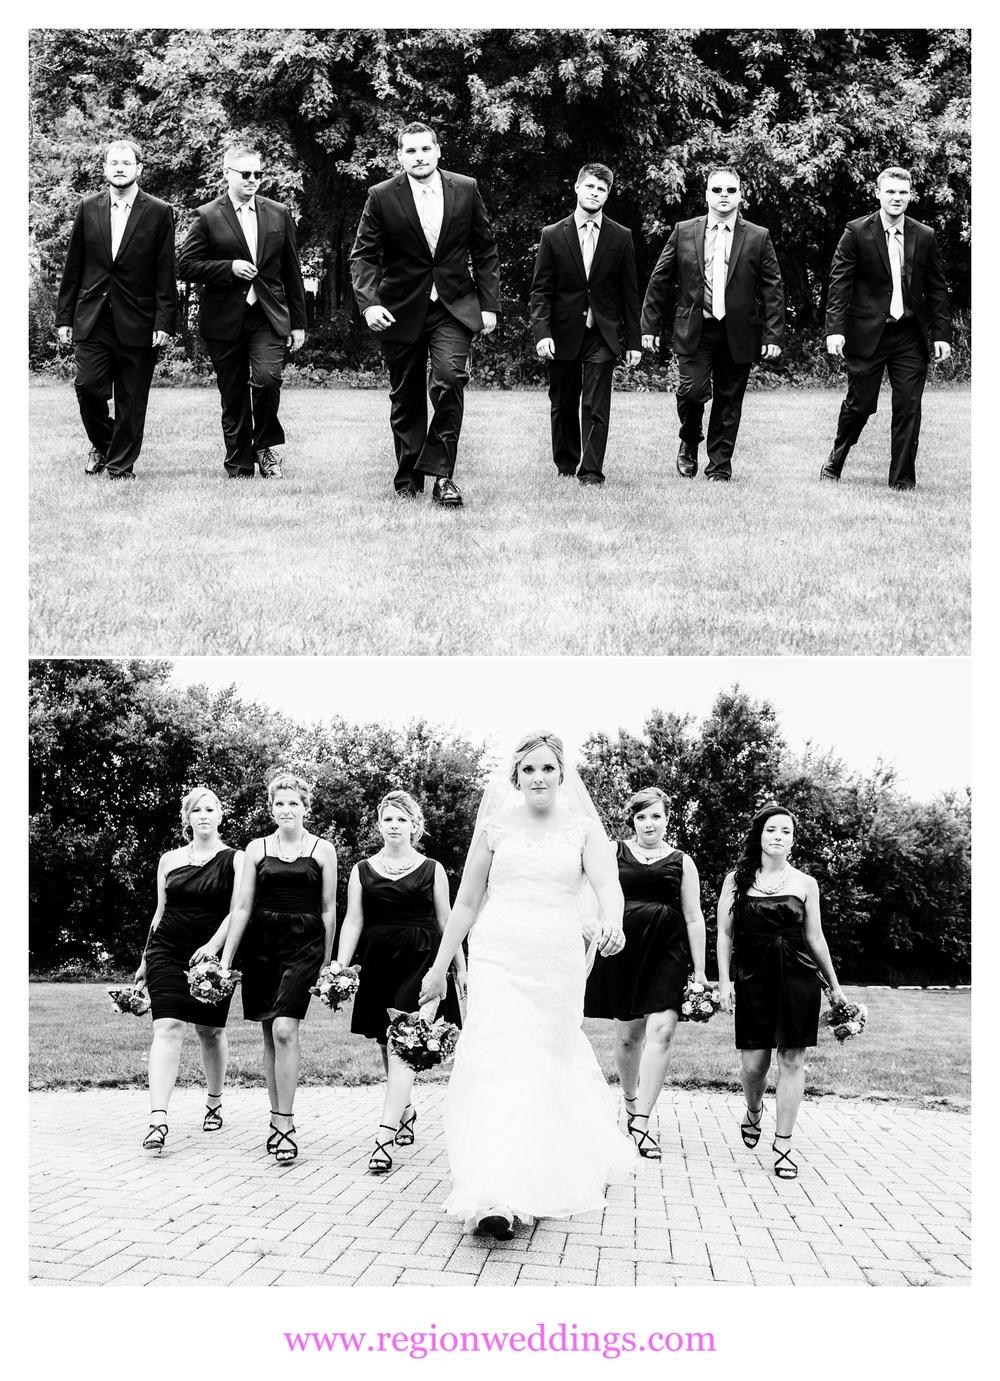 The wedding party fast walks toward the camera.